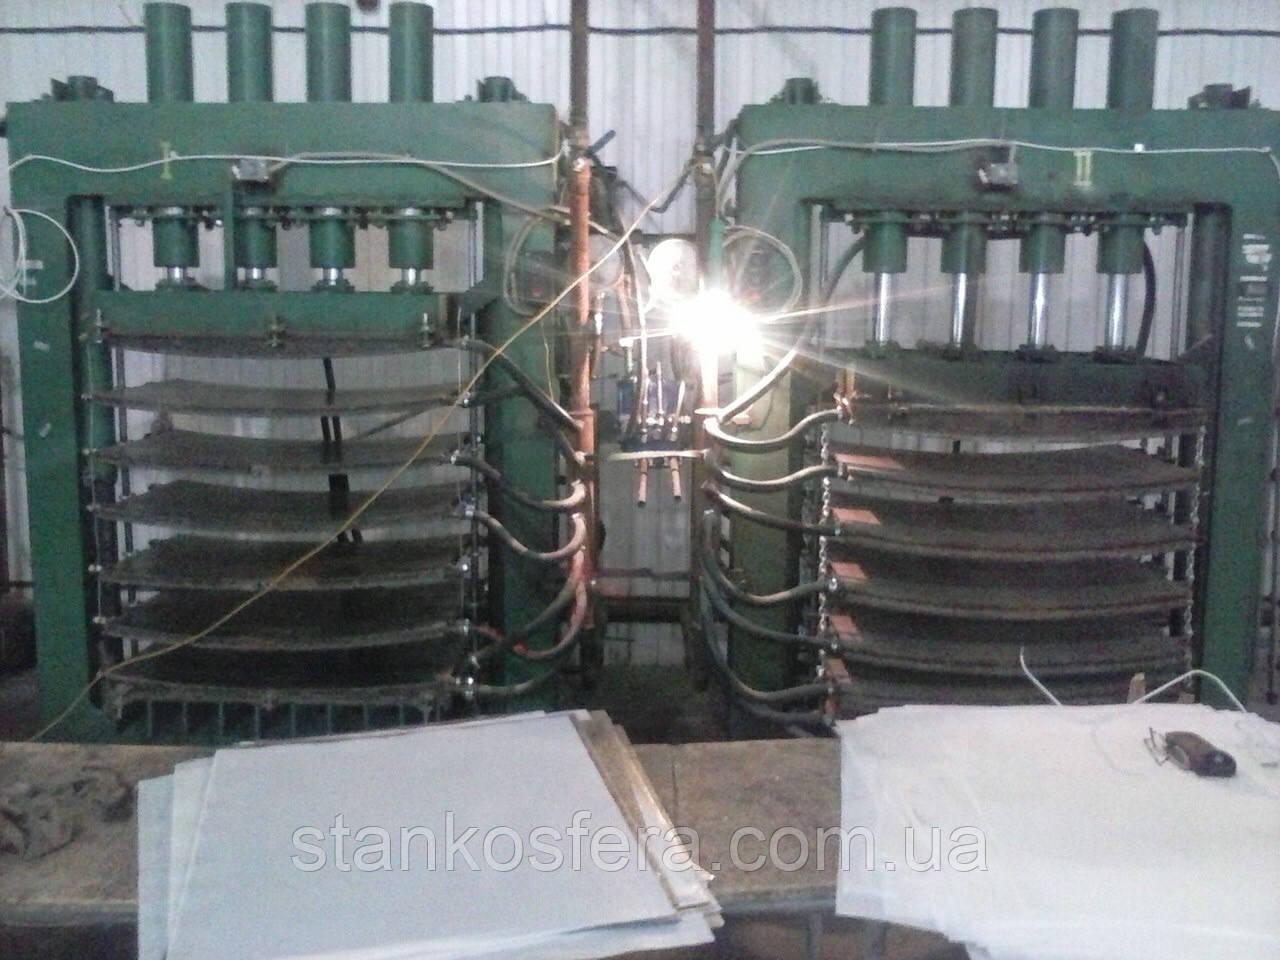 Линия производства ламели: комплект станков б/у